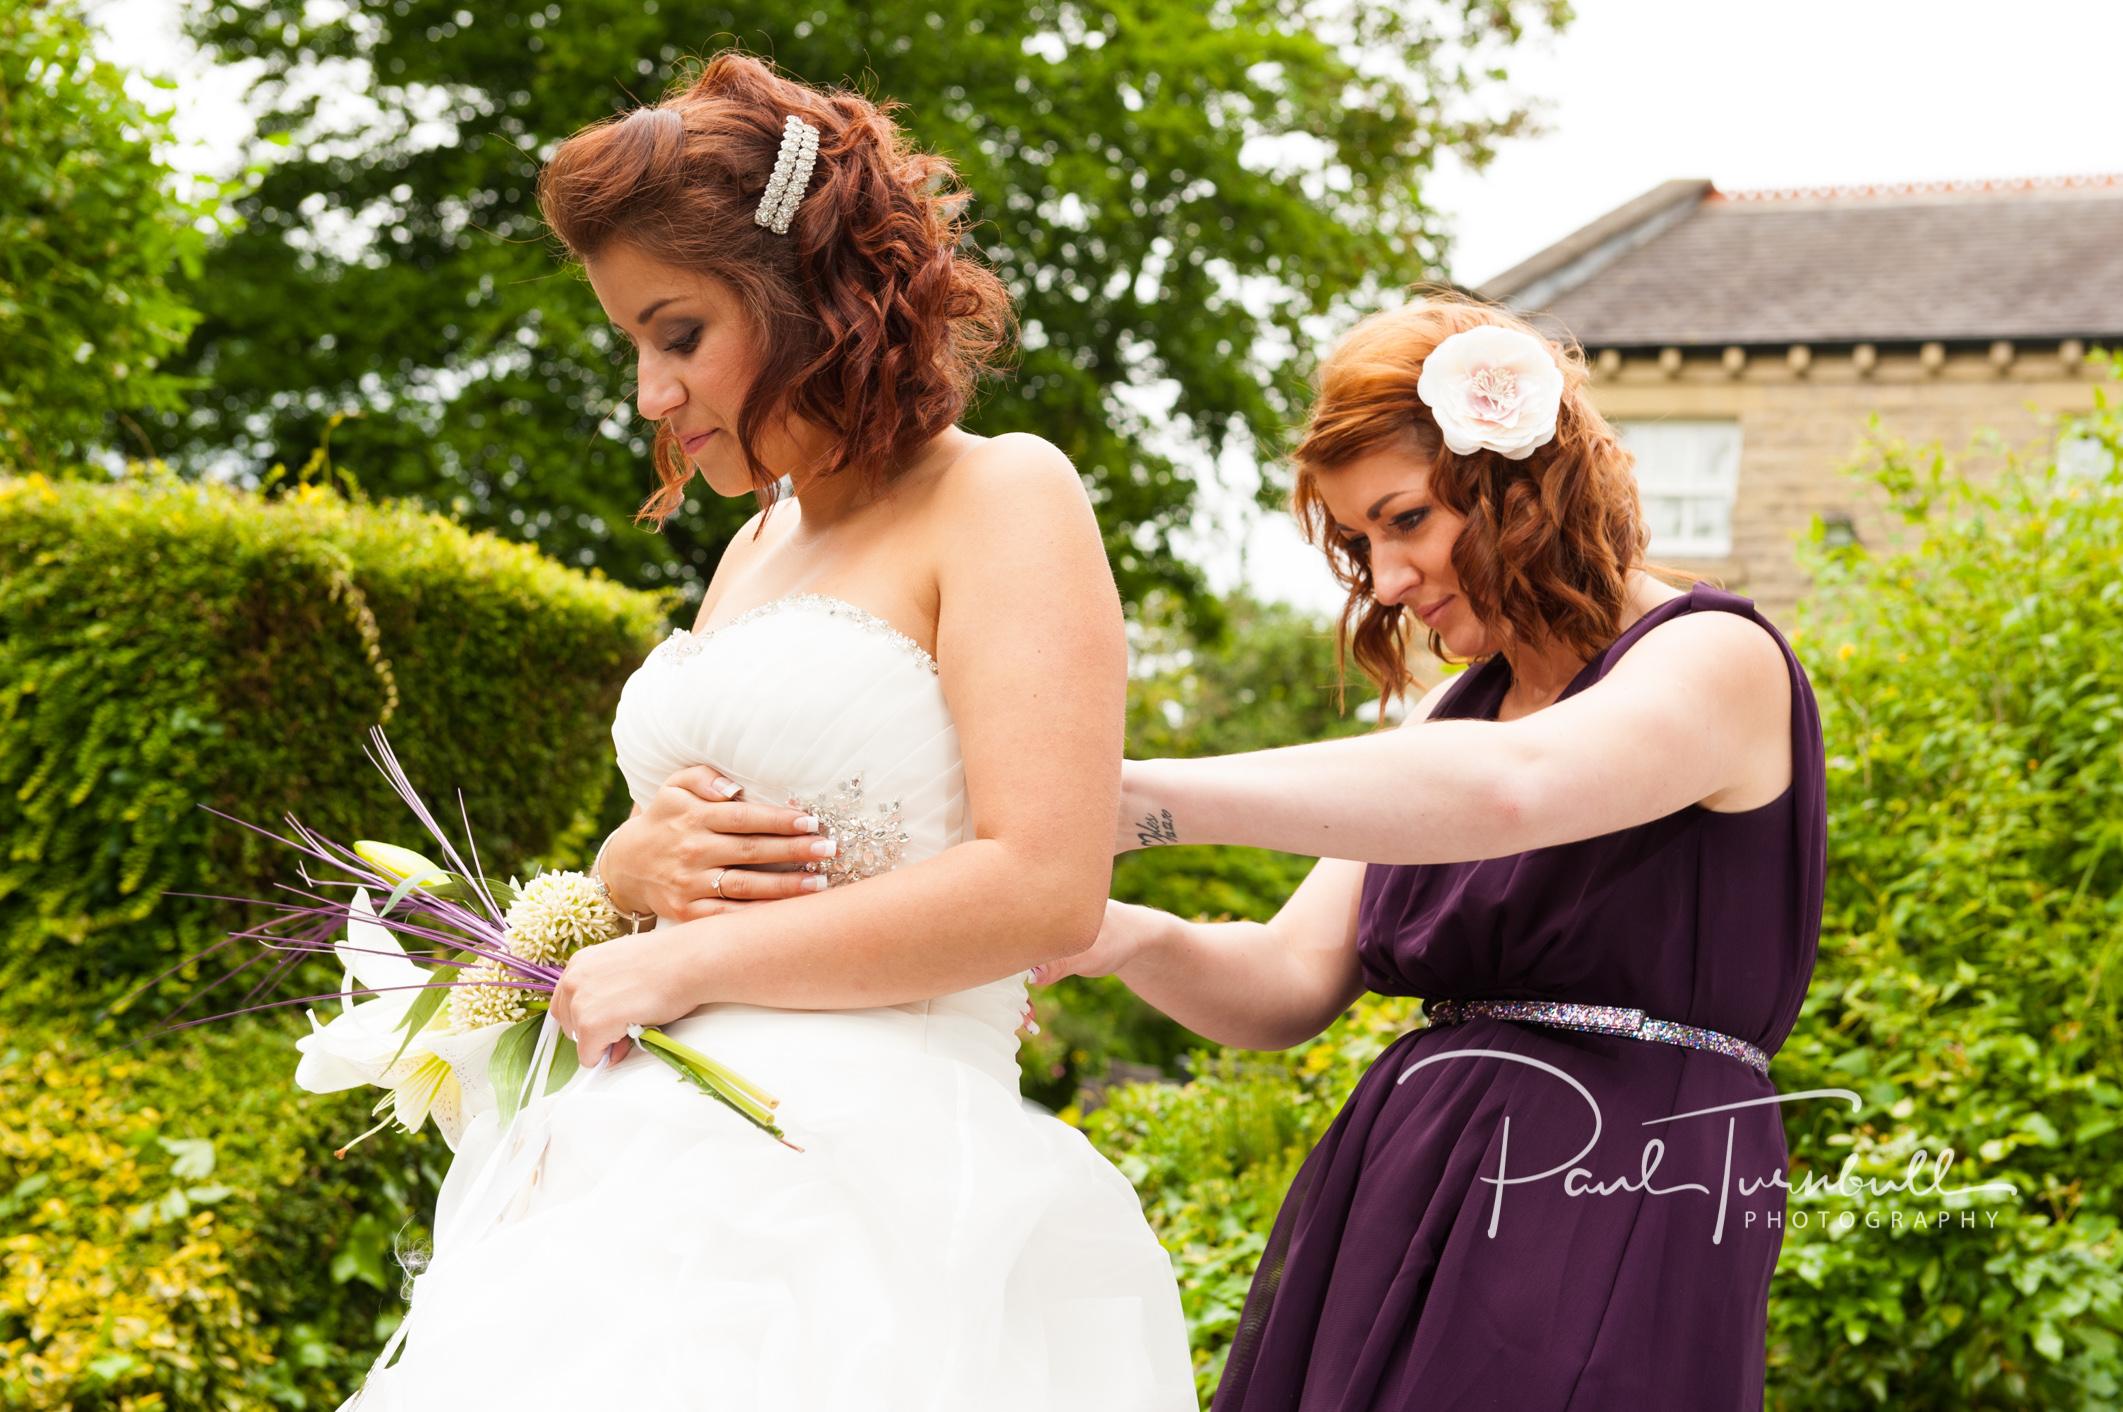 wedding-photography-healds-hall-liversedge-yorkshire-069.jpg